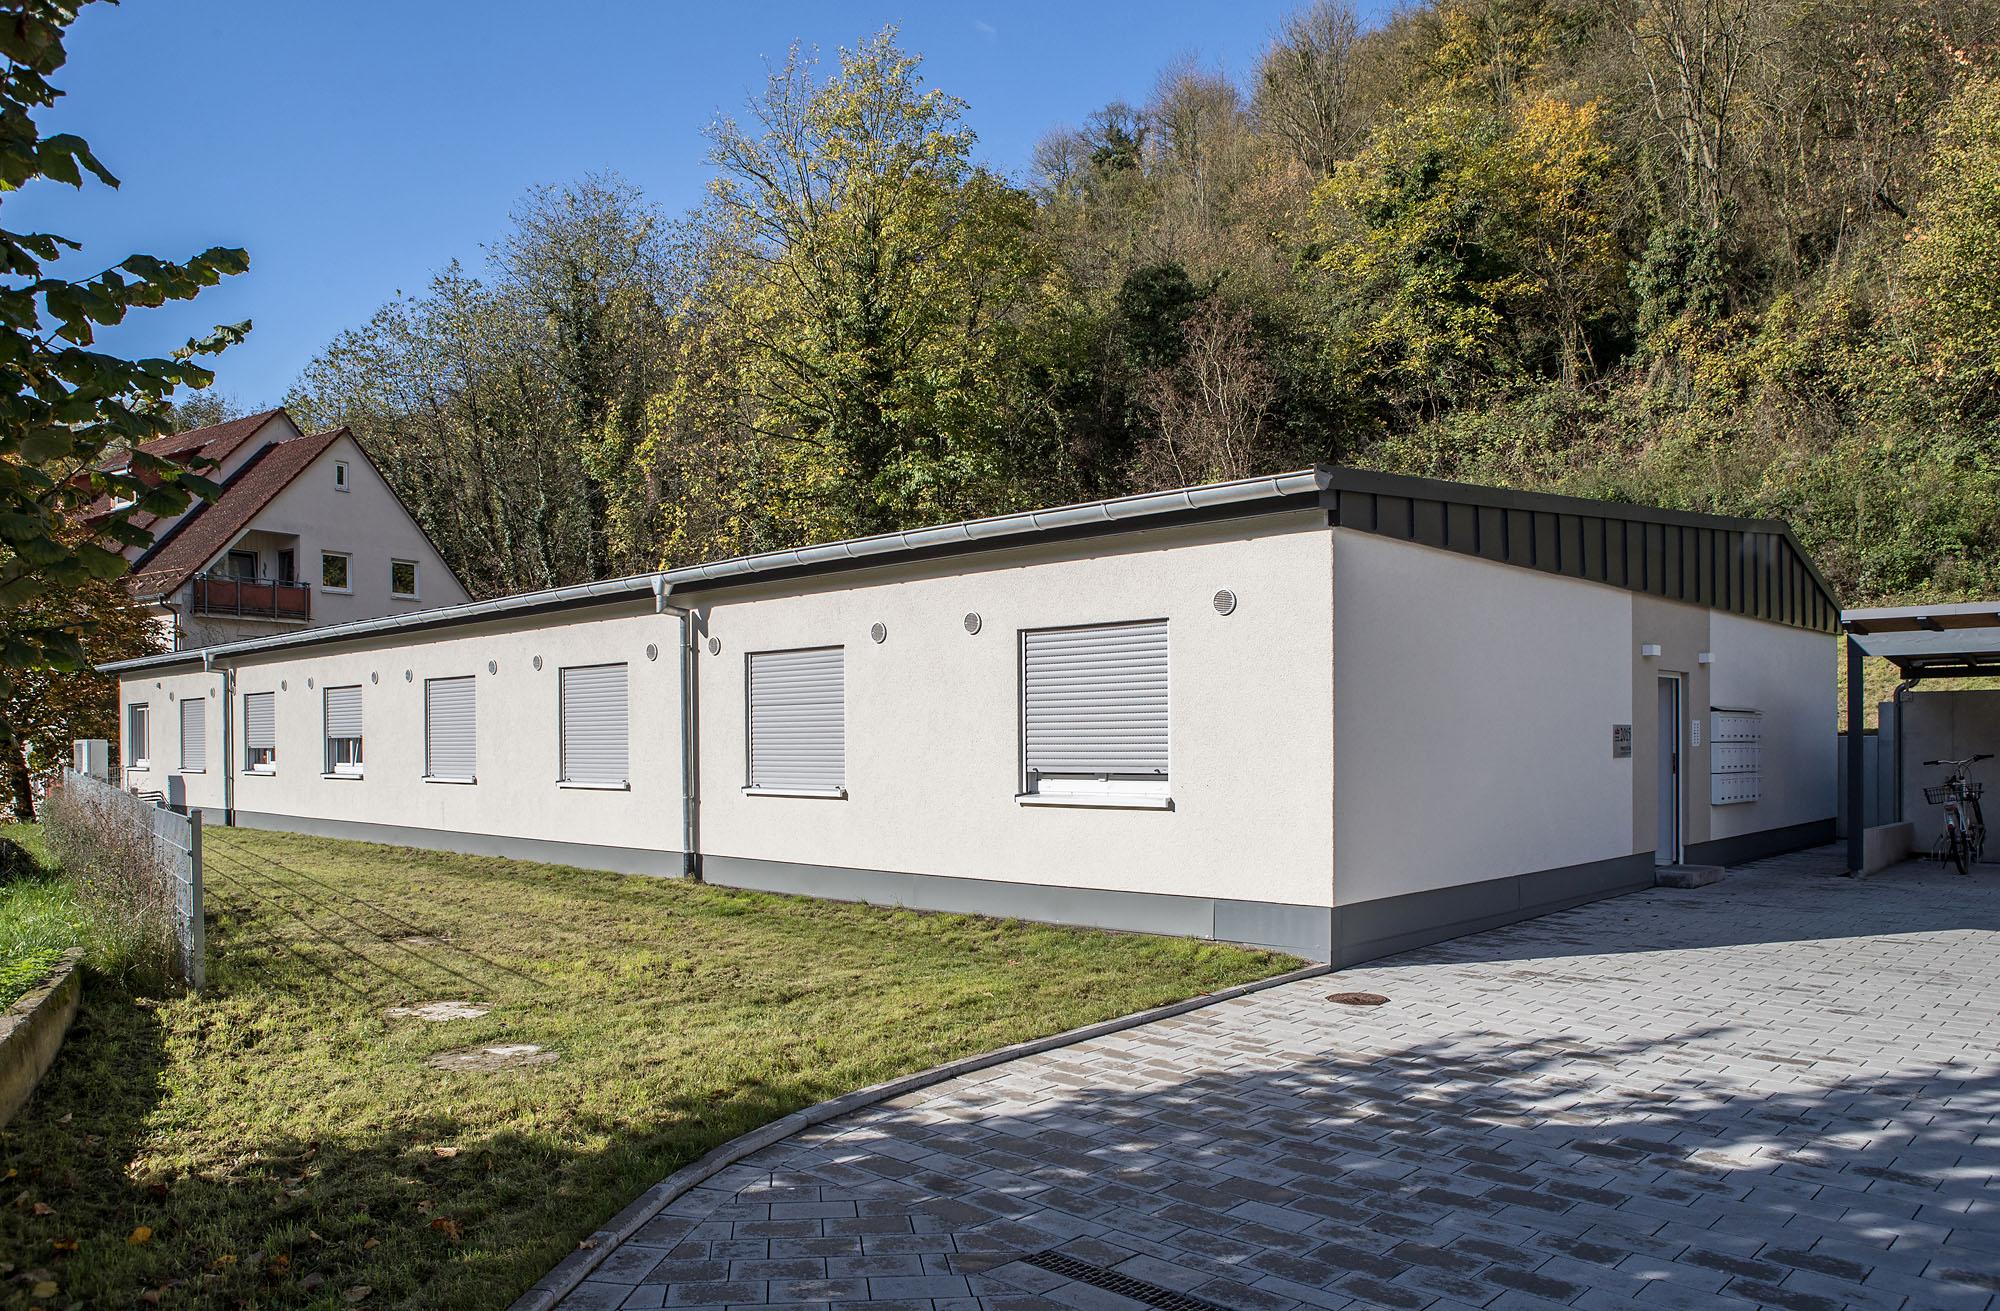 Obdachlosenheim Heppenheim